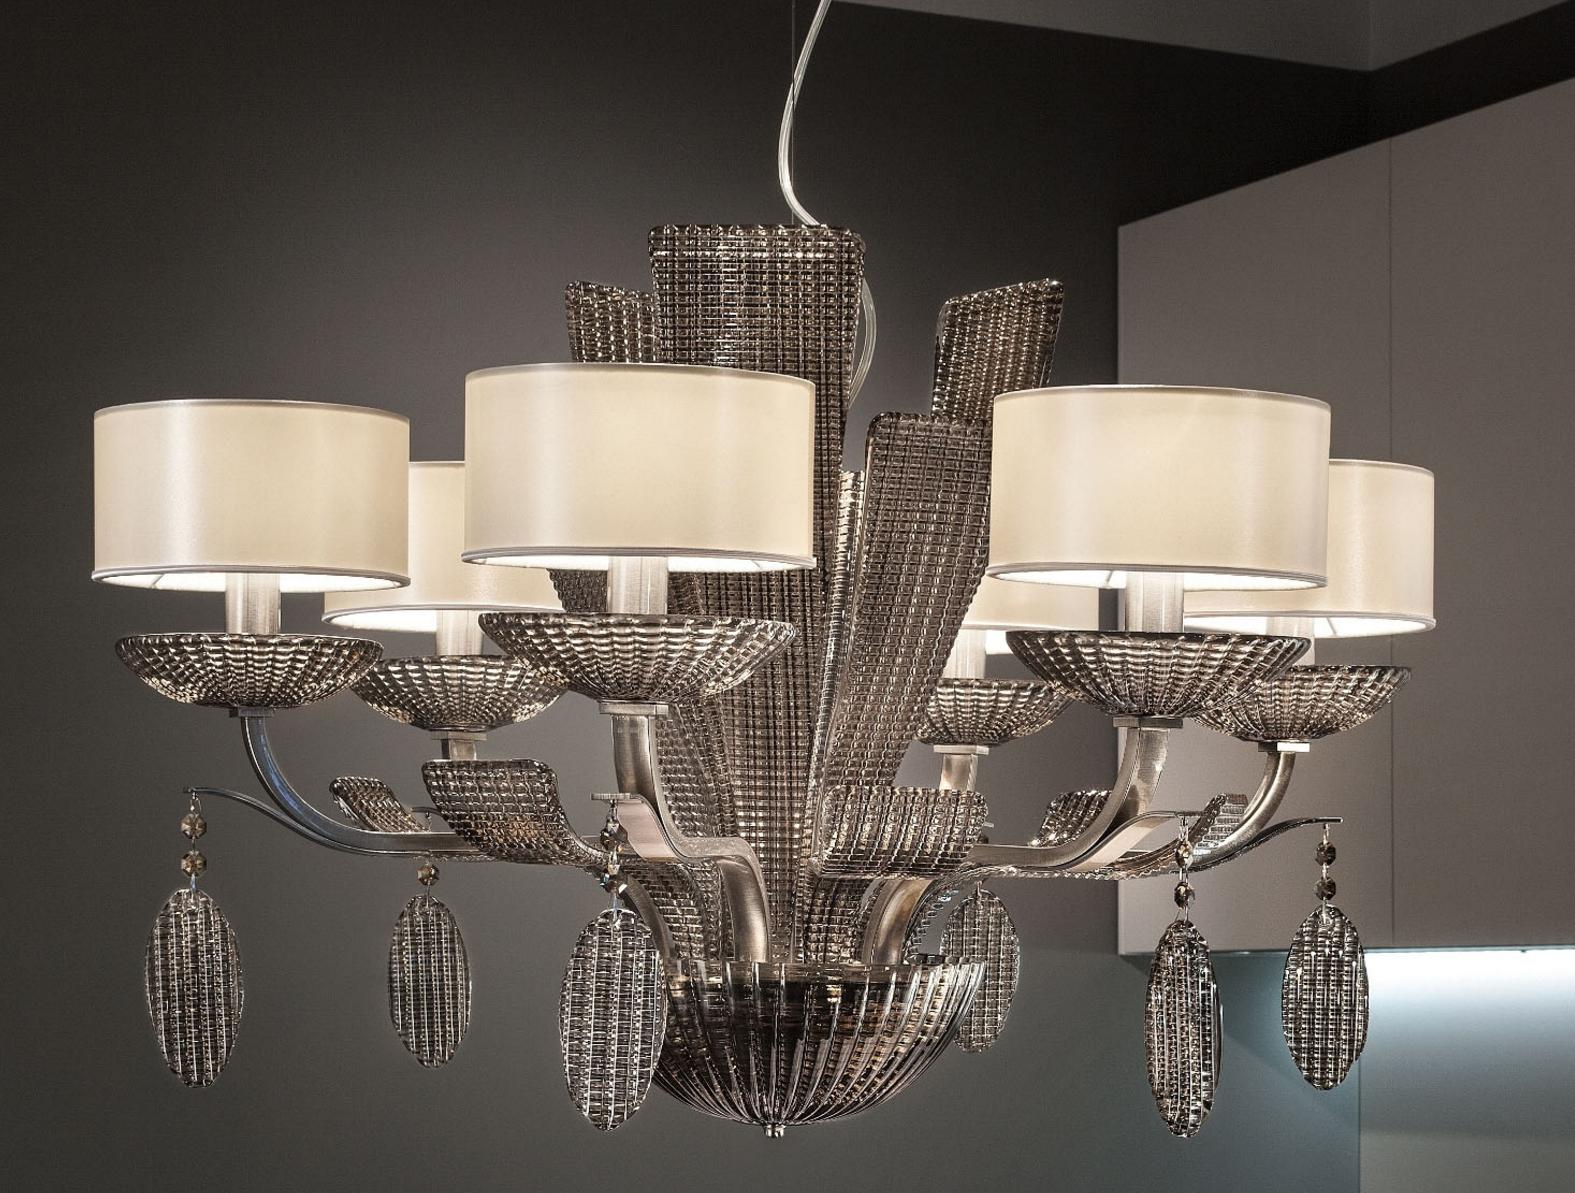 Isbel A Lamp Designed By Masiero Lampadario In Vetro Lampadari Vetro Veneziano